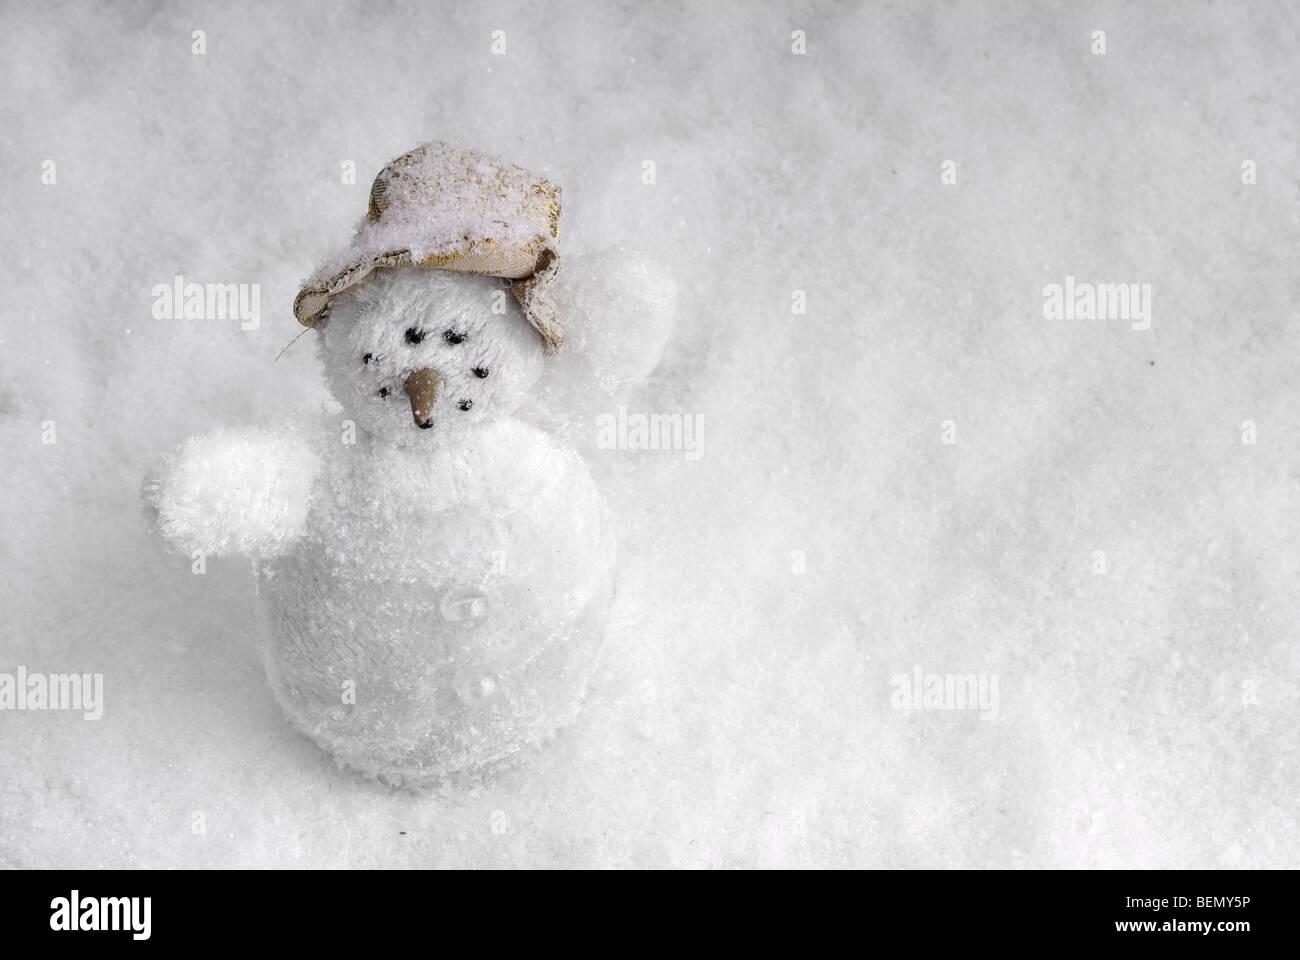 snowman in snow landscape - Stock Image